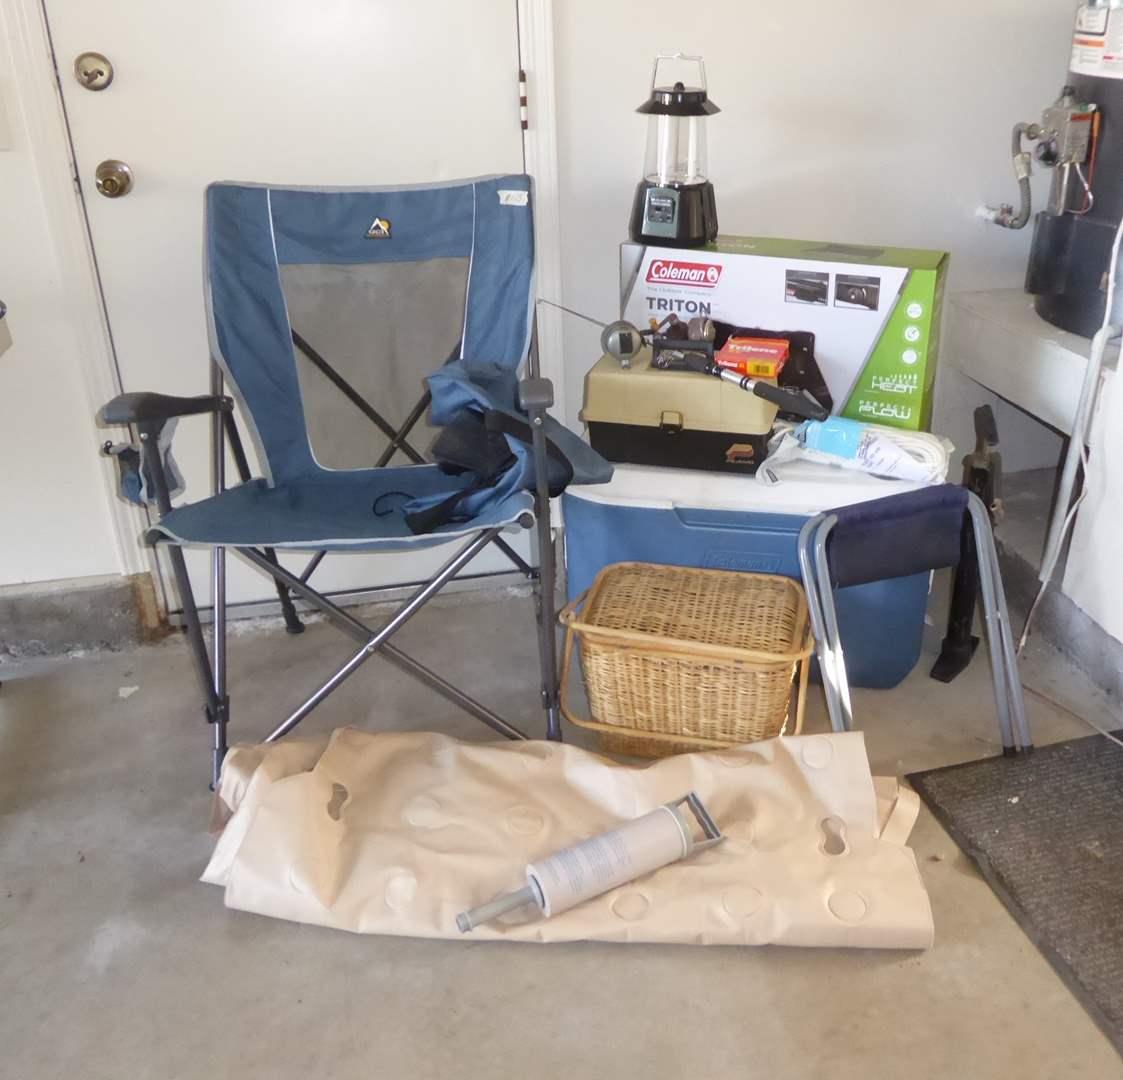 Lot # 173 - Camping Lot - Coleman Stove, Ice Chest, Waffle Mattress & MG Picnic Basket  (main image)